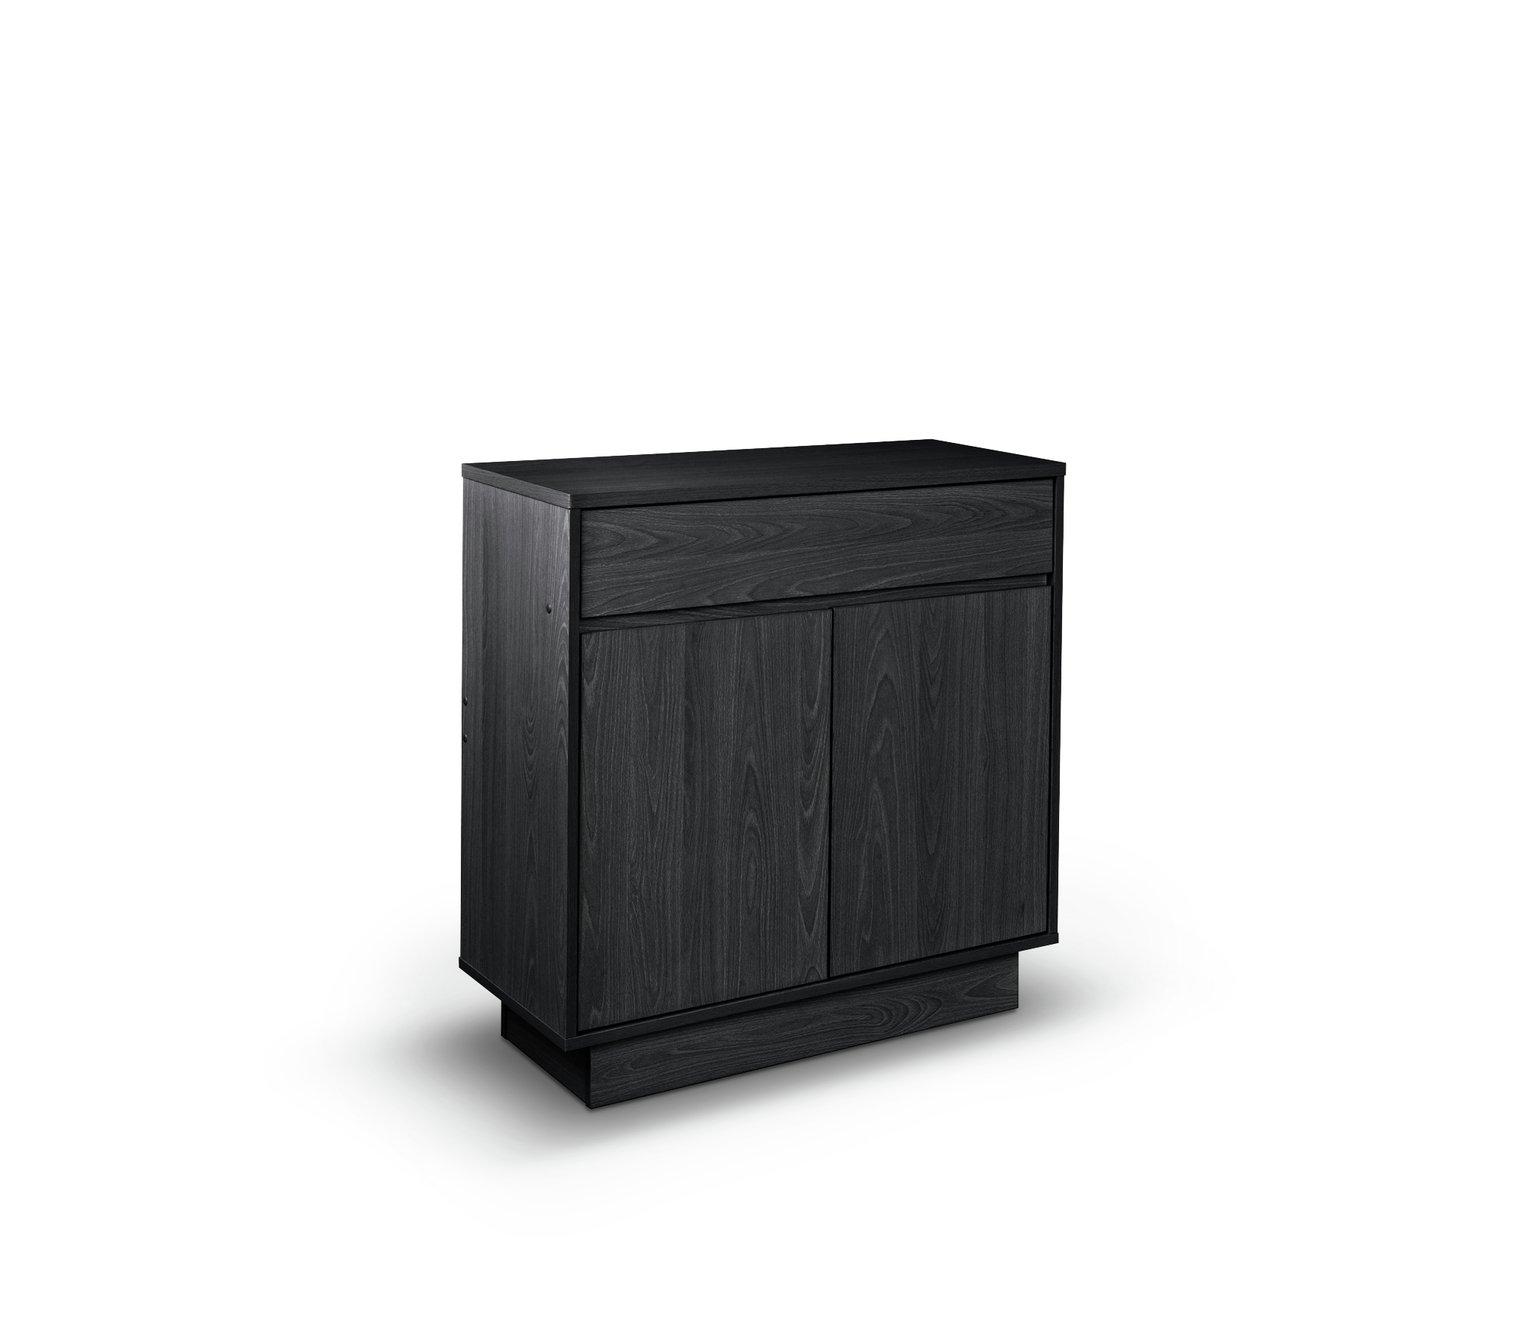 Argos Home Cubes 2 Door 1 Drw Small Sideboard - Black Ash